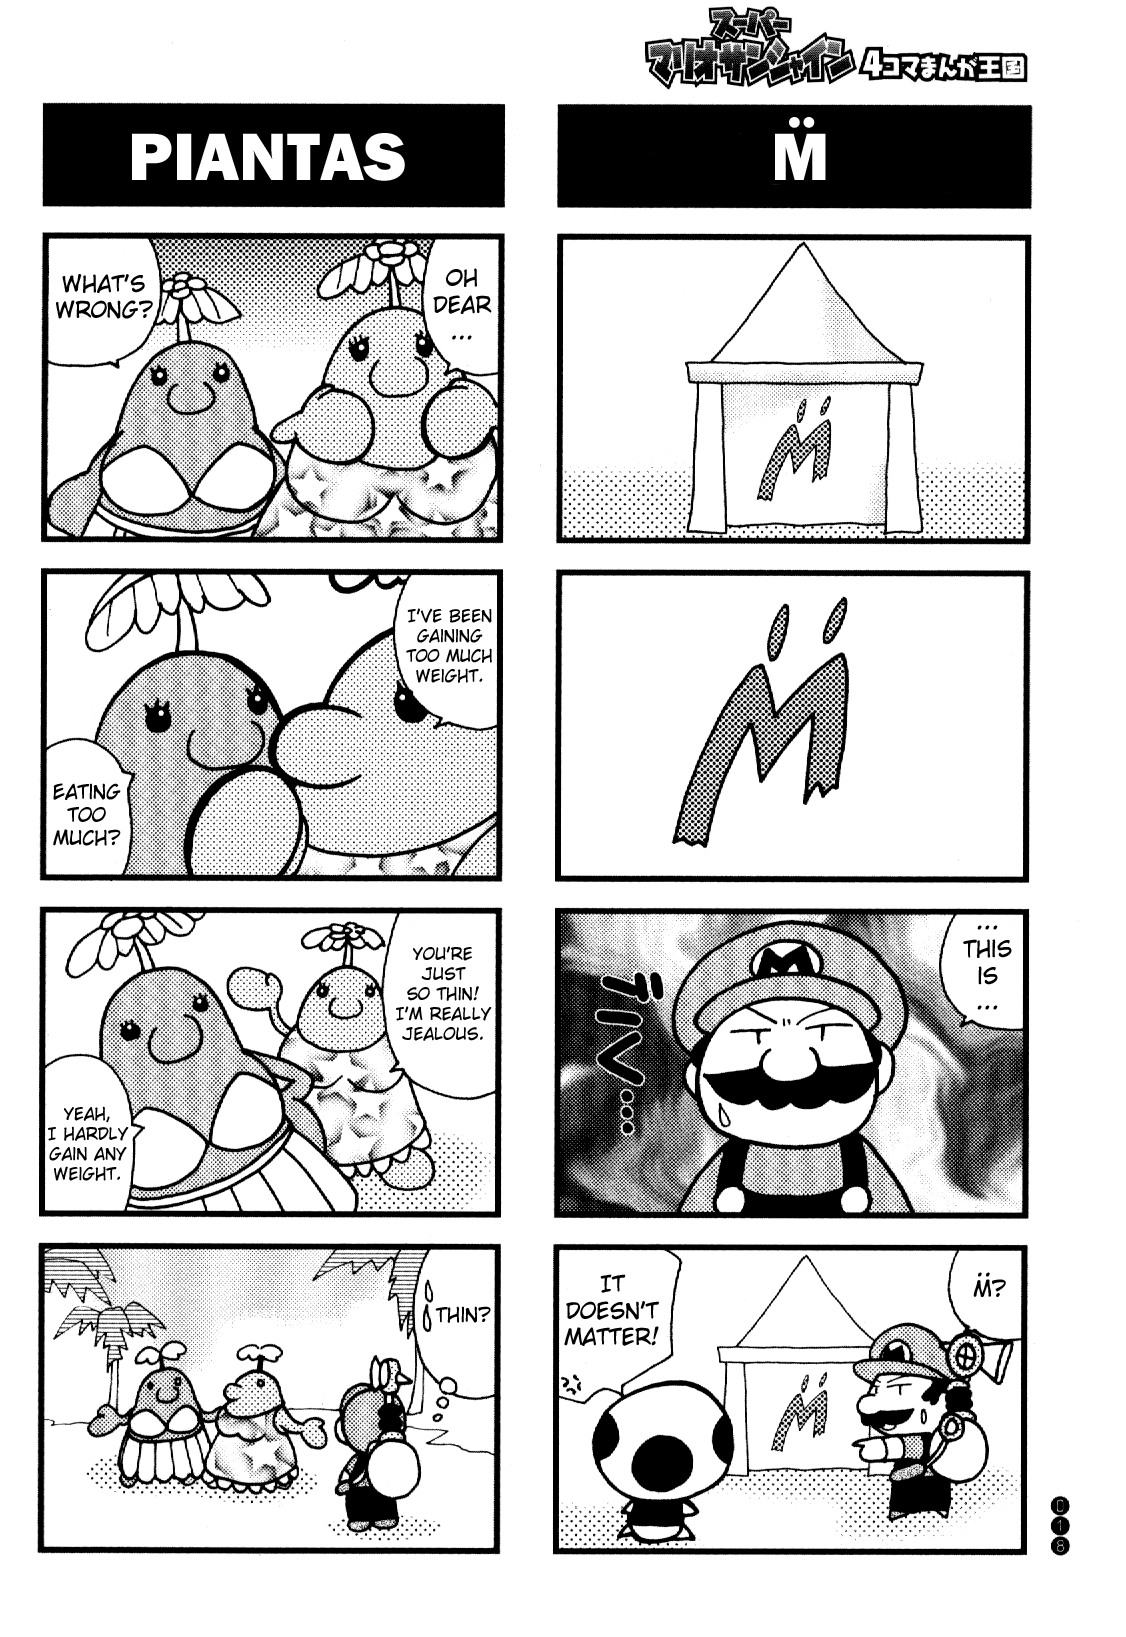 Gaffer Mario Full knowledge 4koma Manga Lands - faithfulness 2